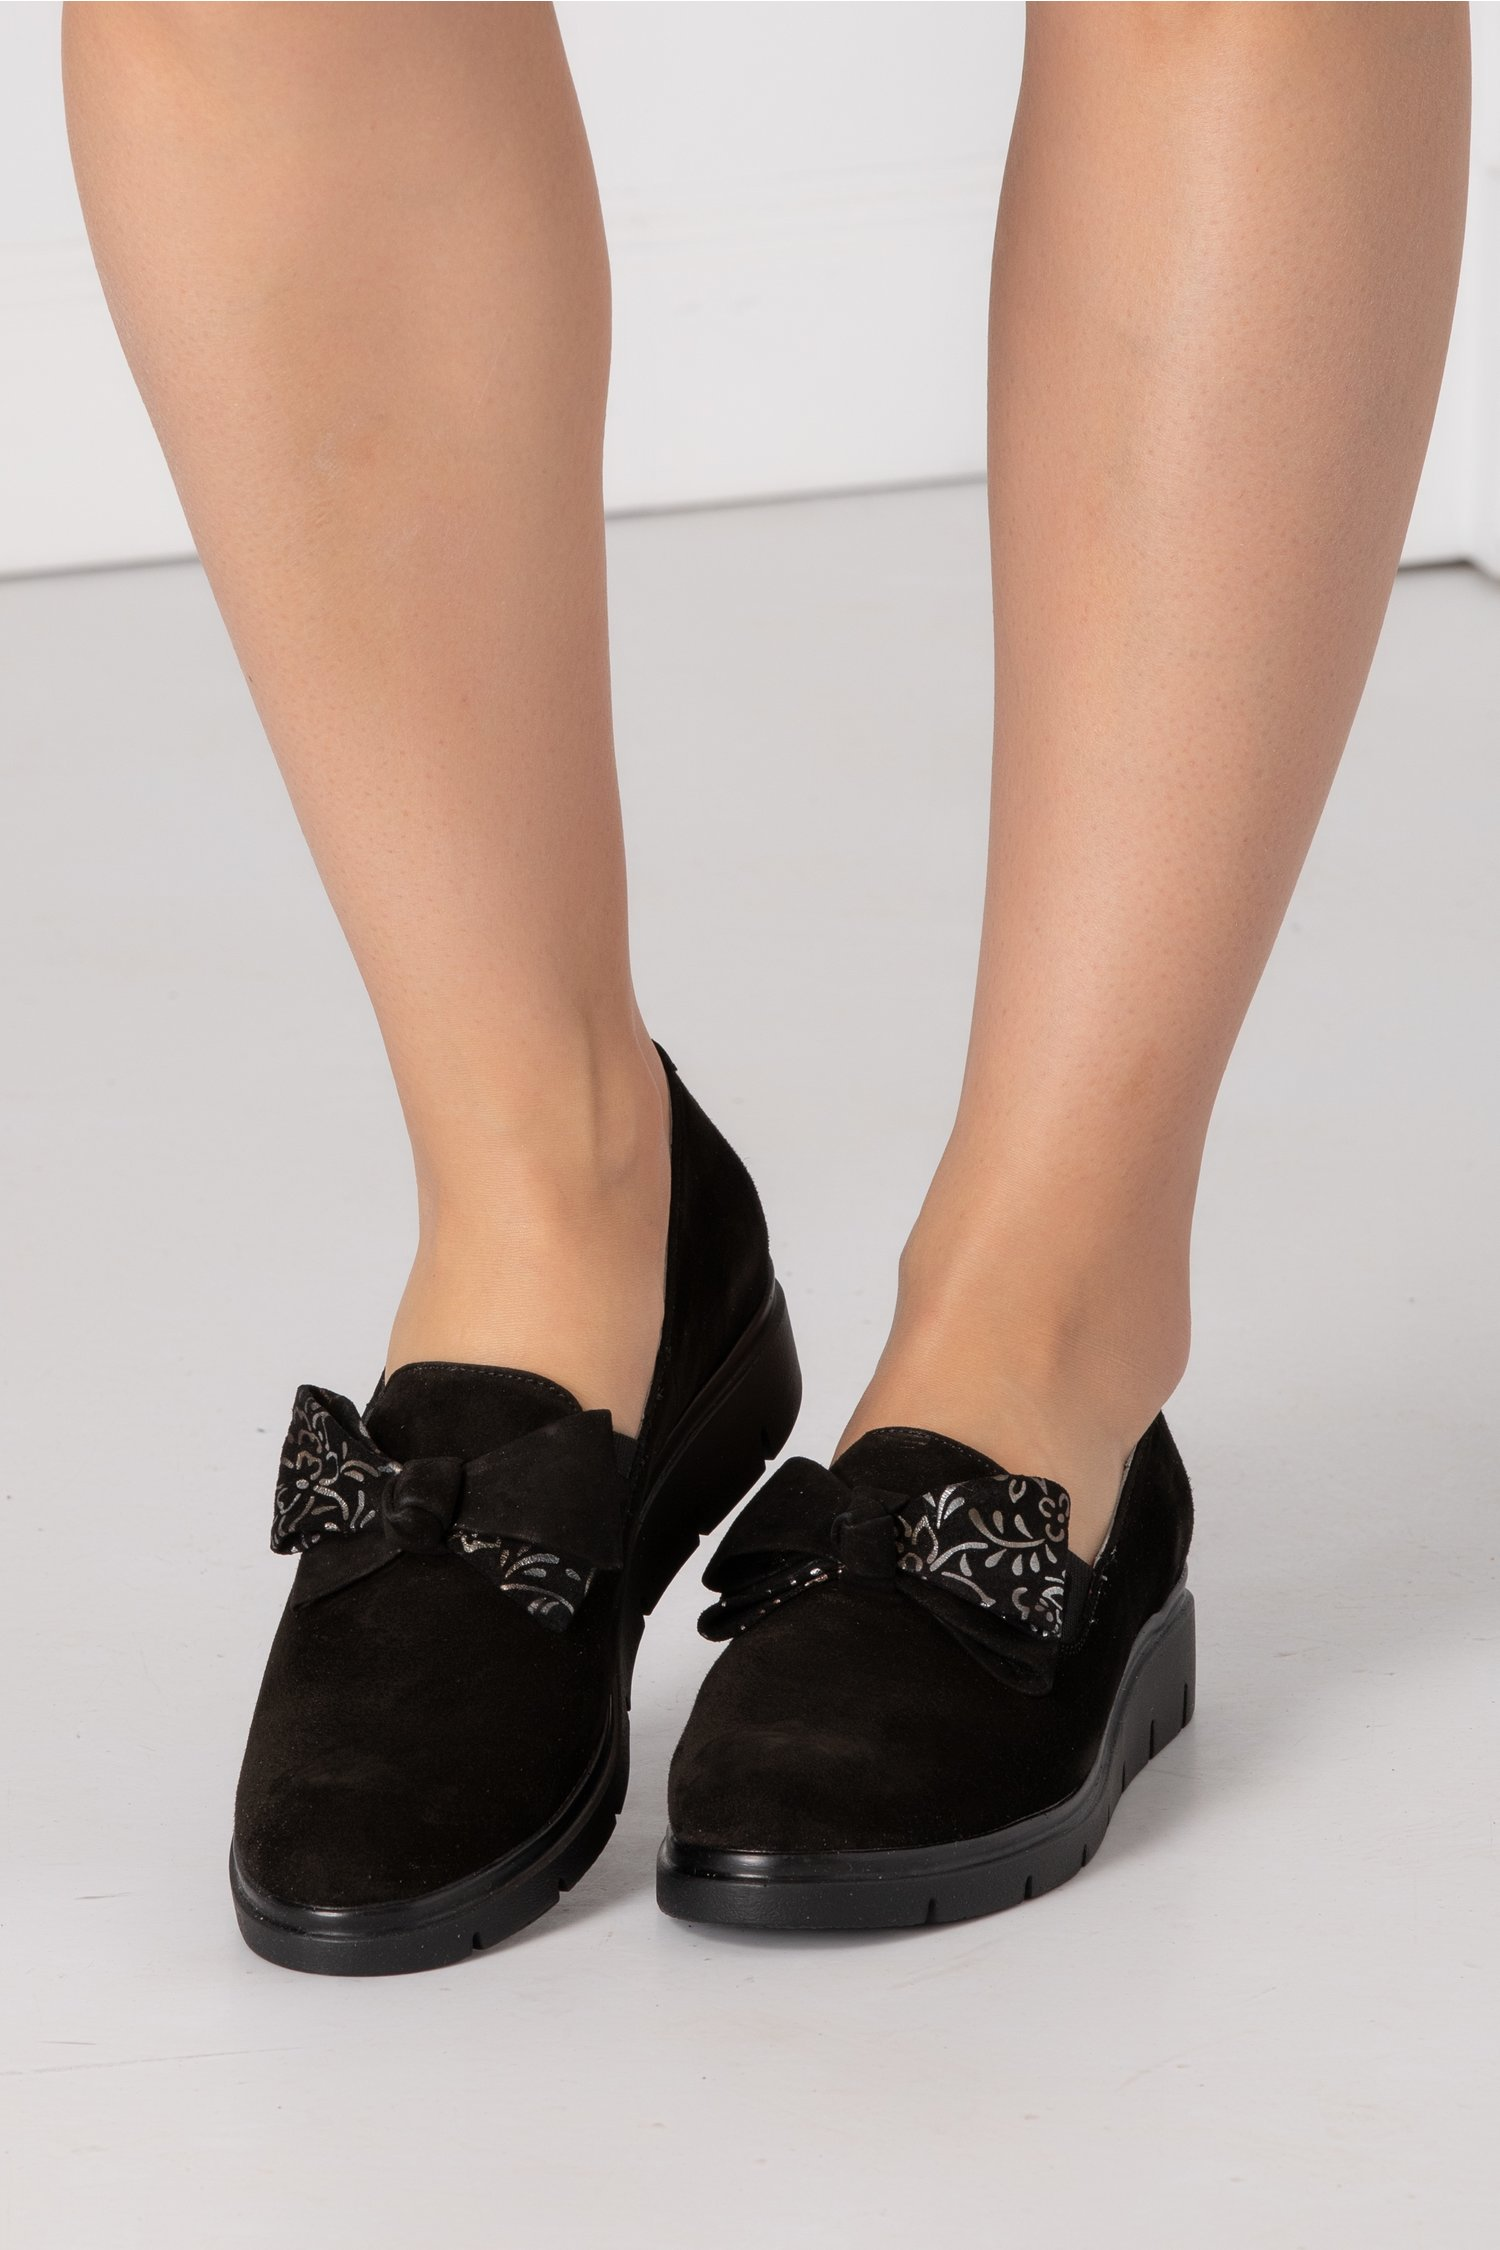 Pantofi Emma negri din piele intoarsa cu funda